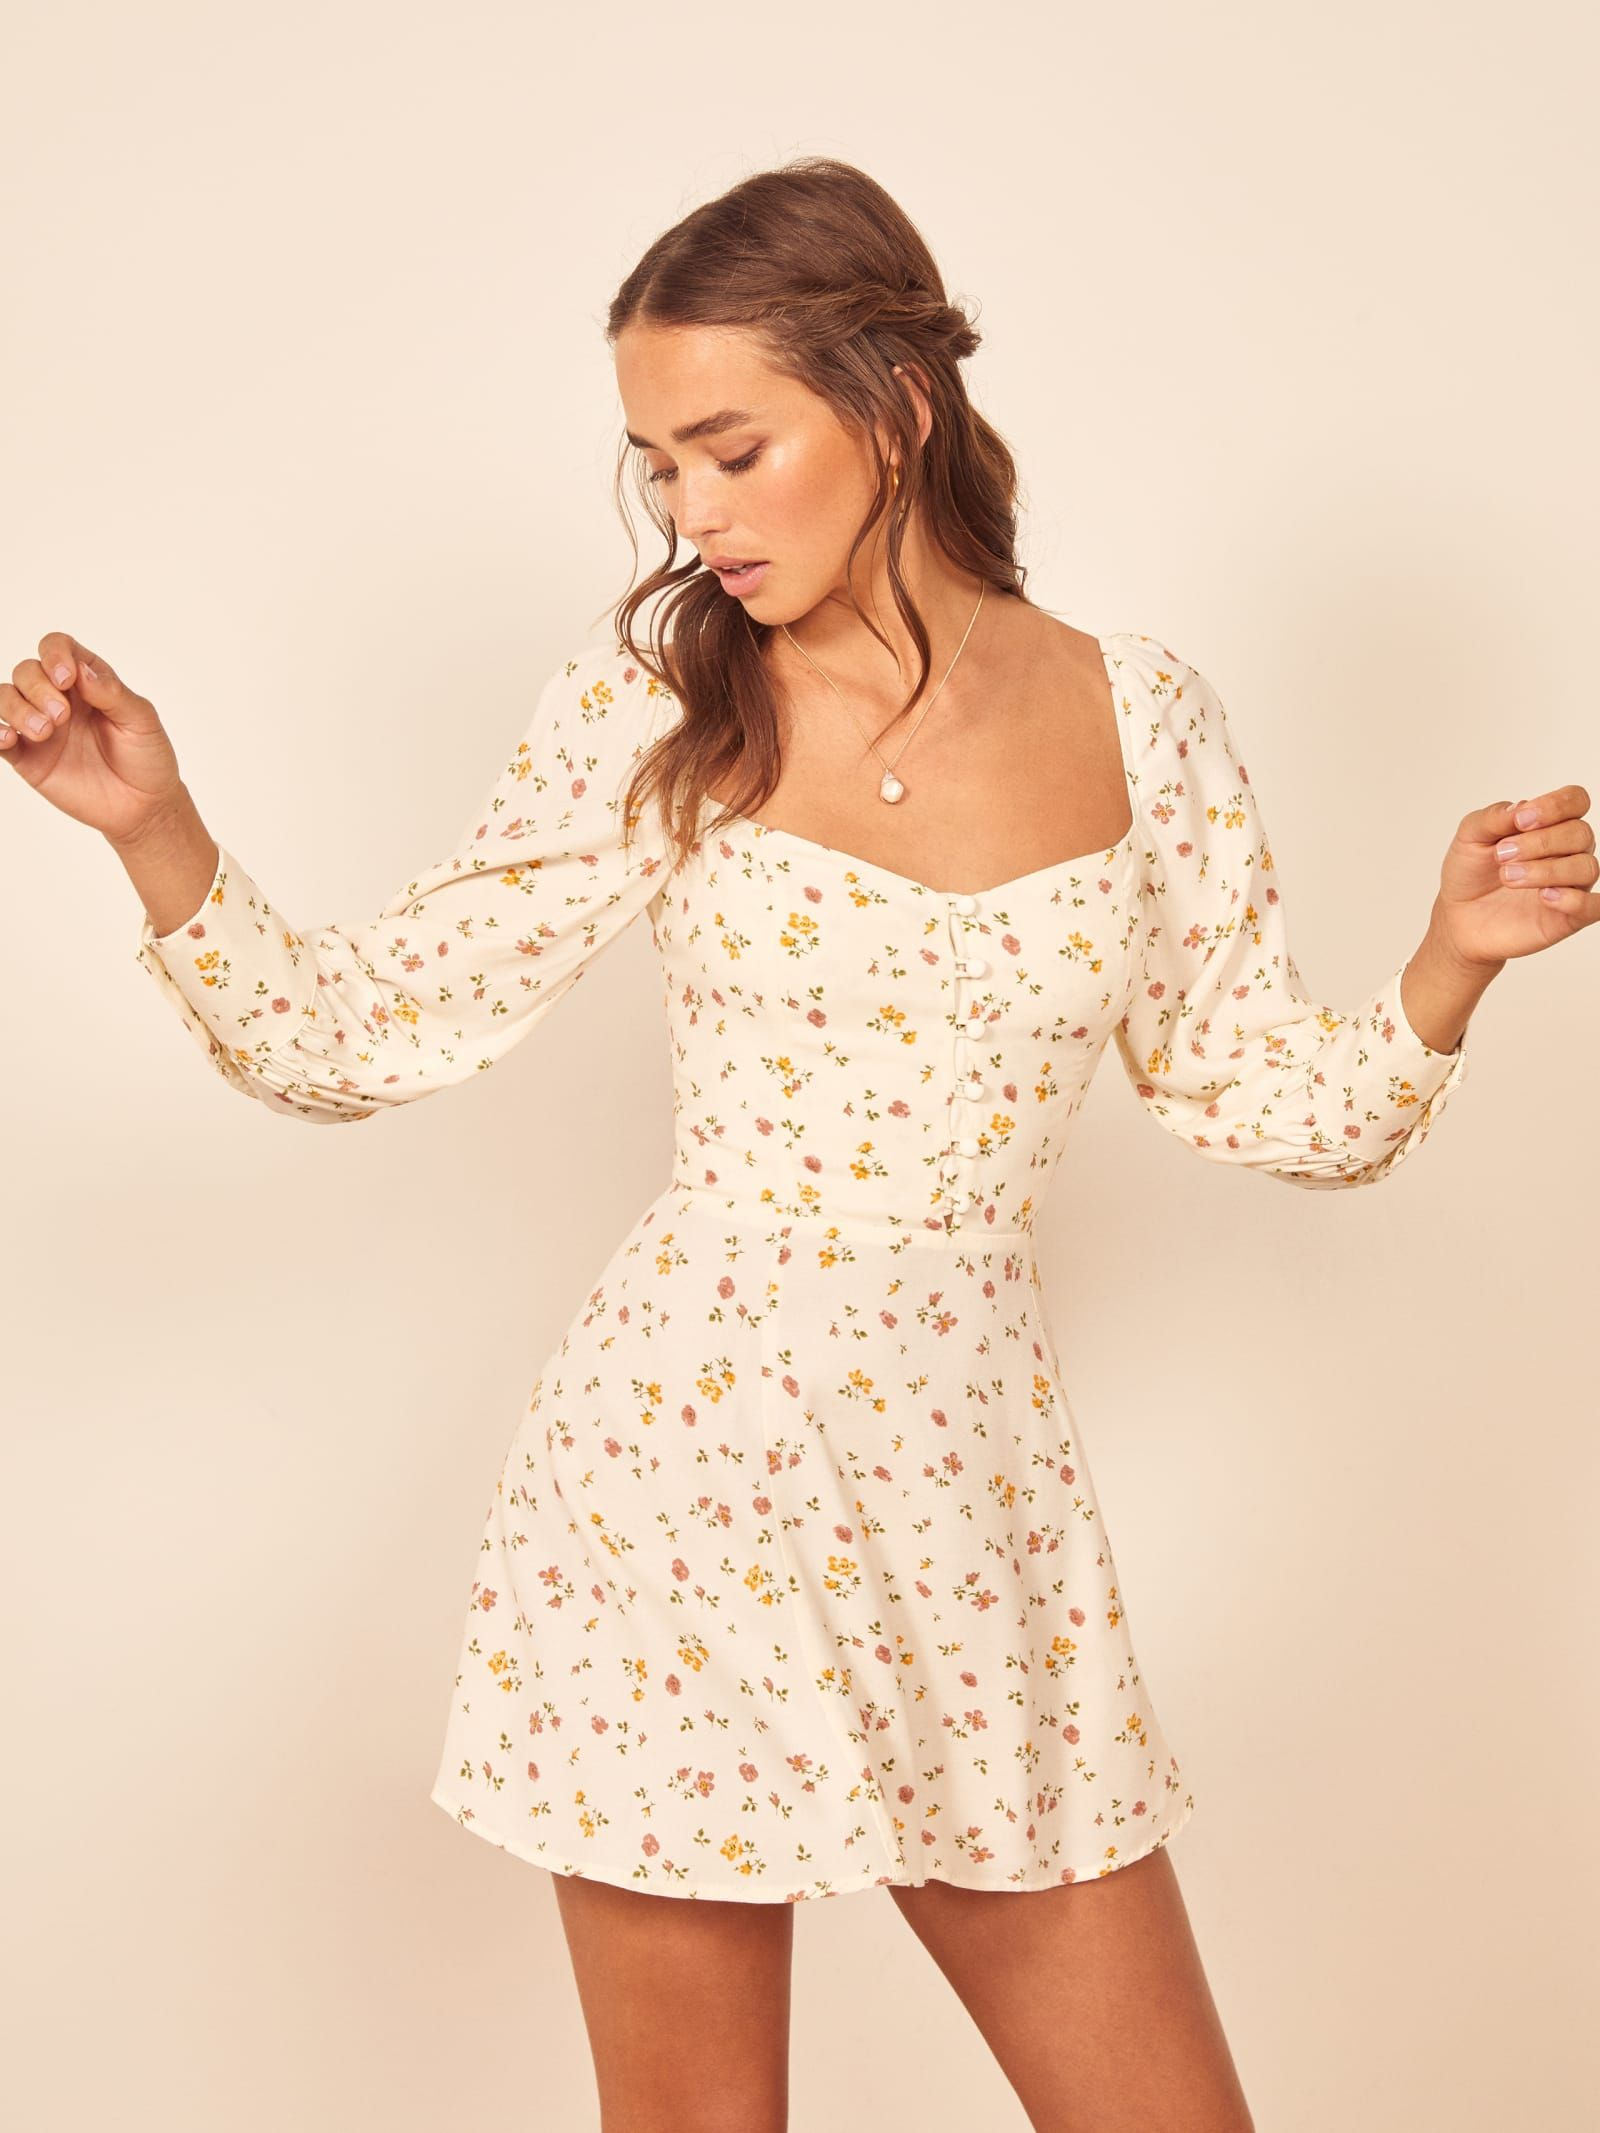 Lumiere Dress Short Dresses Casual Fashion Outfits Summer Dresses [ 2133 x 1600 Pixel ]